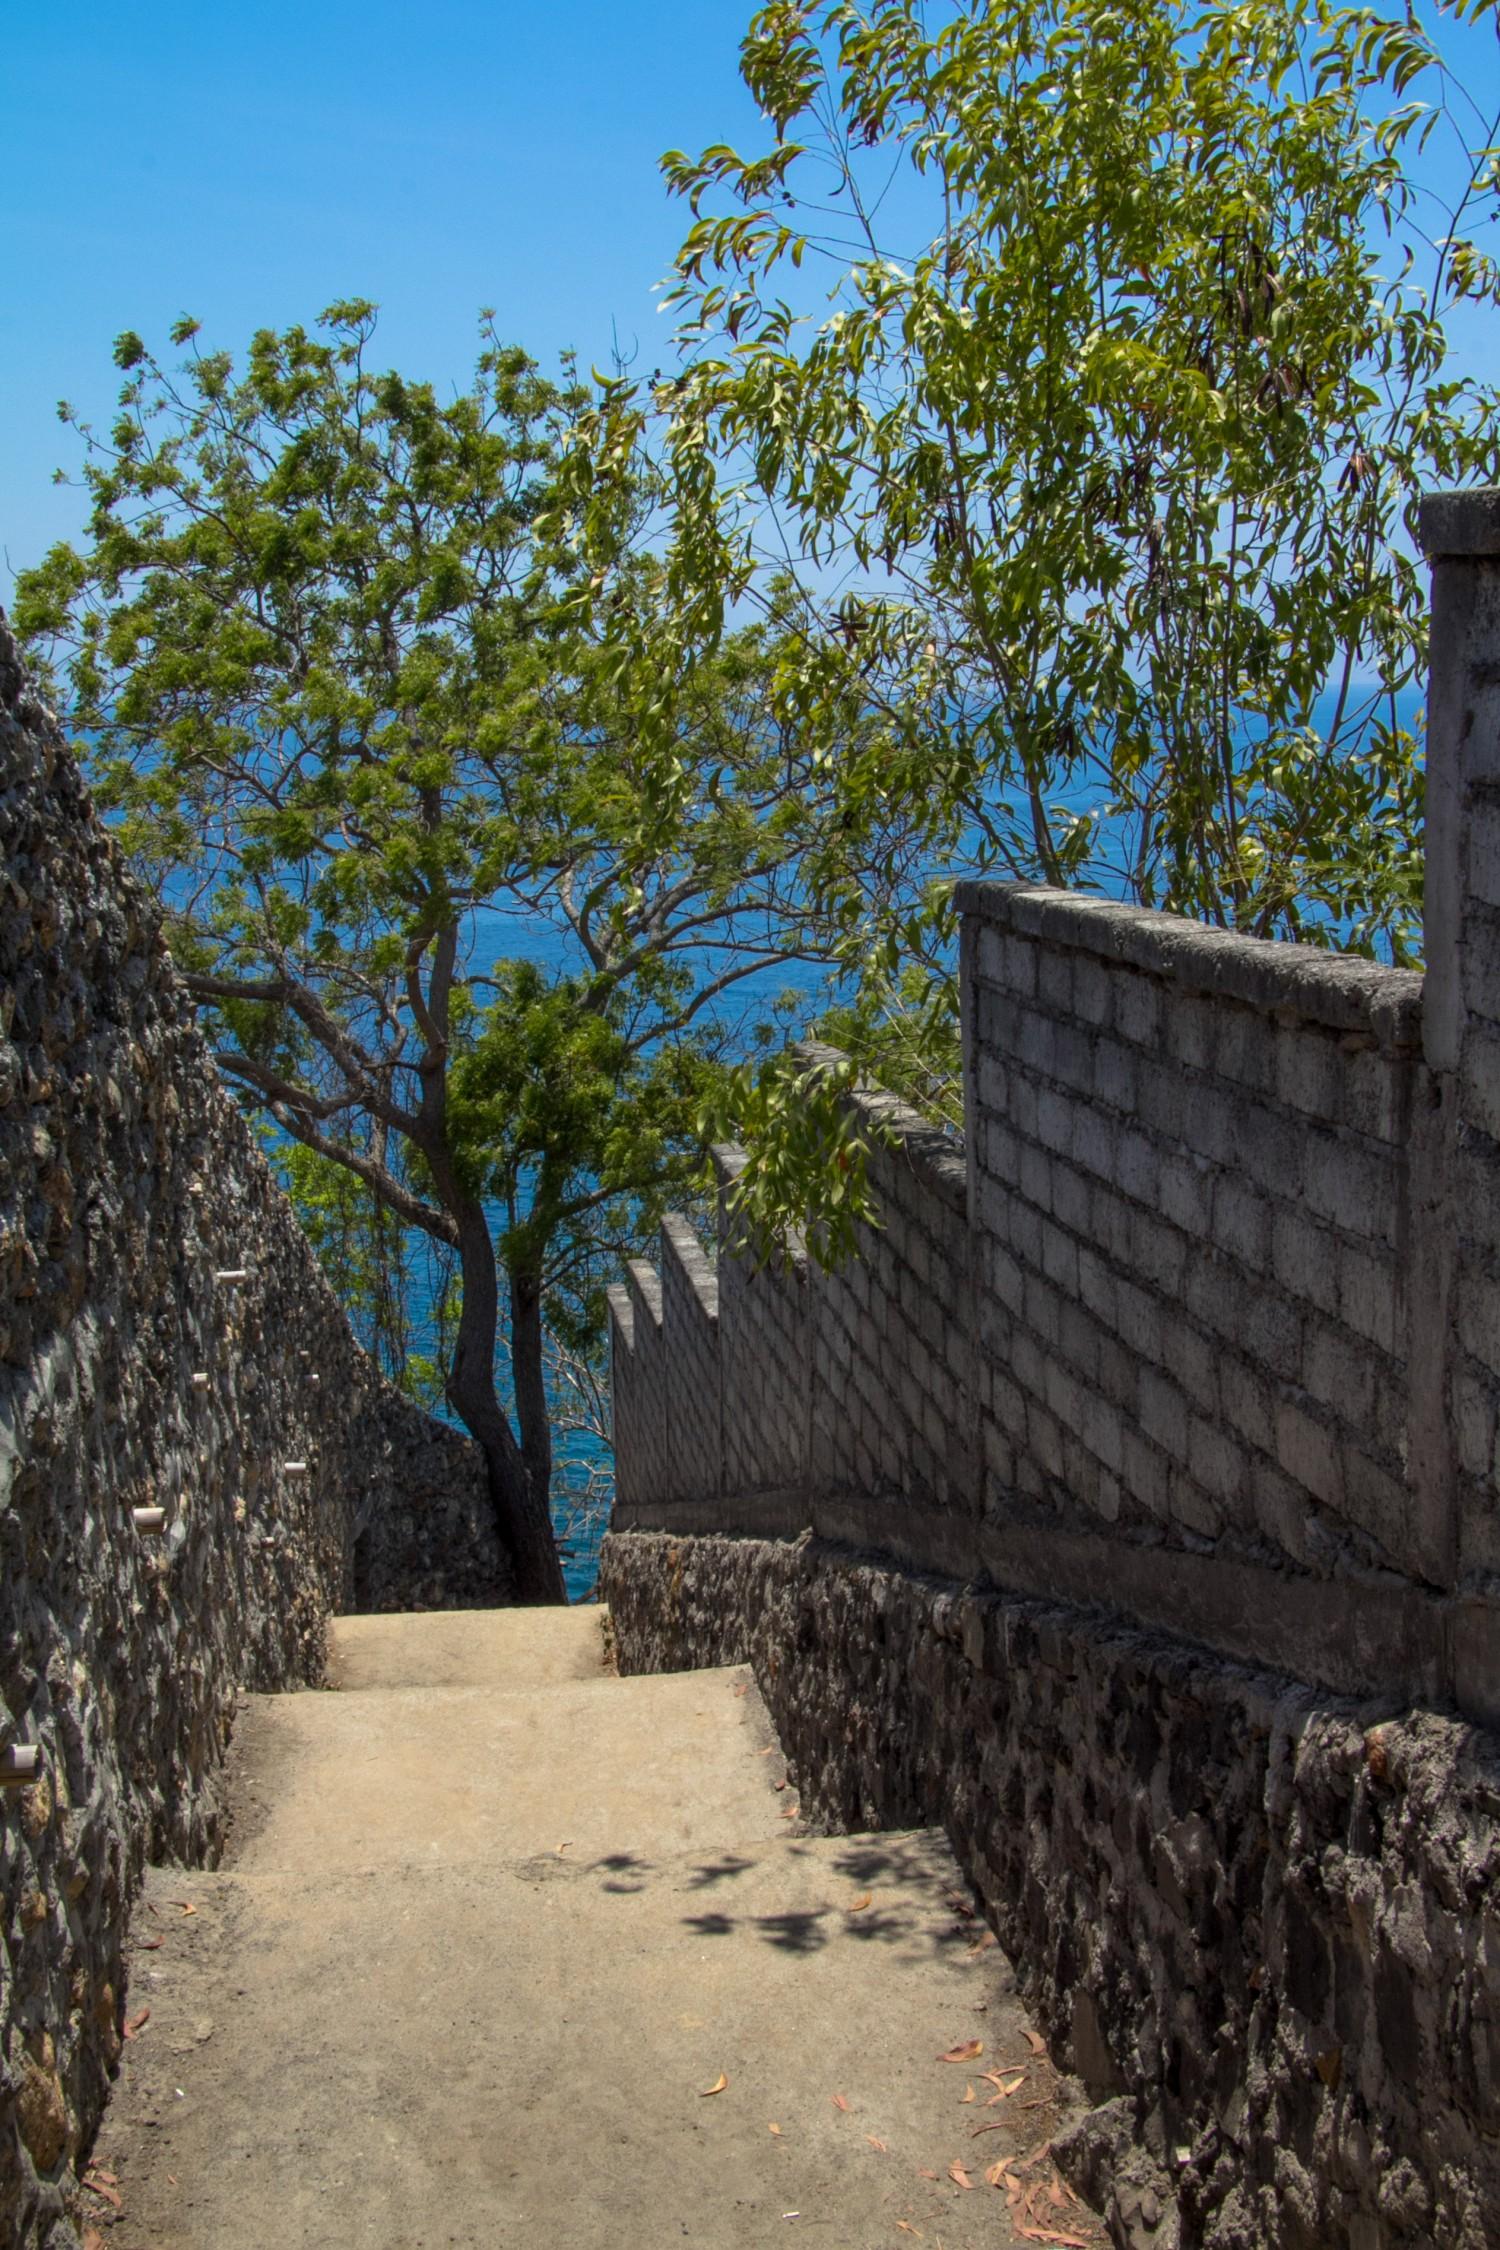 BIASTUGEL BEACH BALI (1)